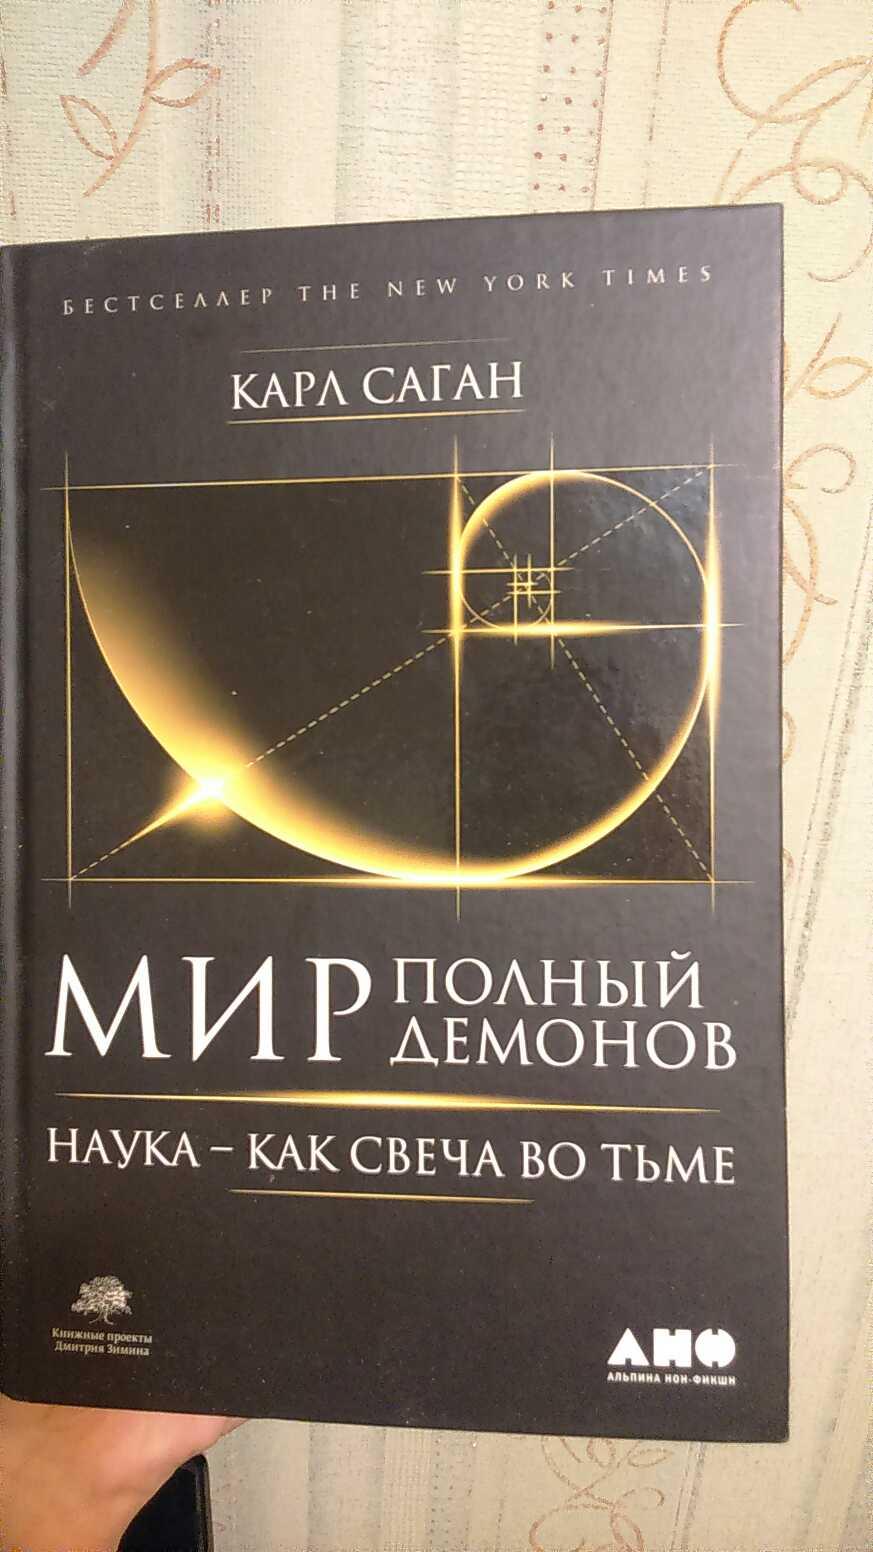 Book (ISBN: 5916716591)